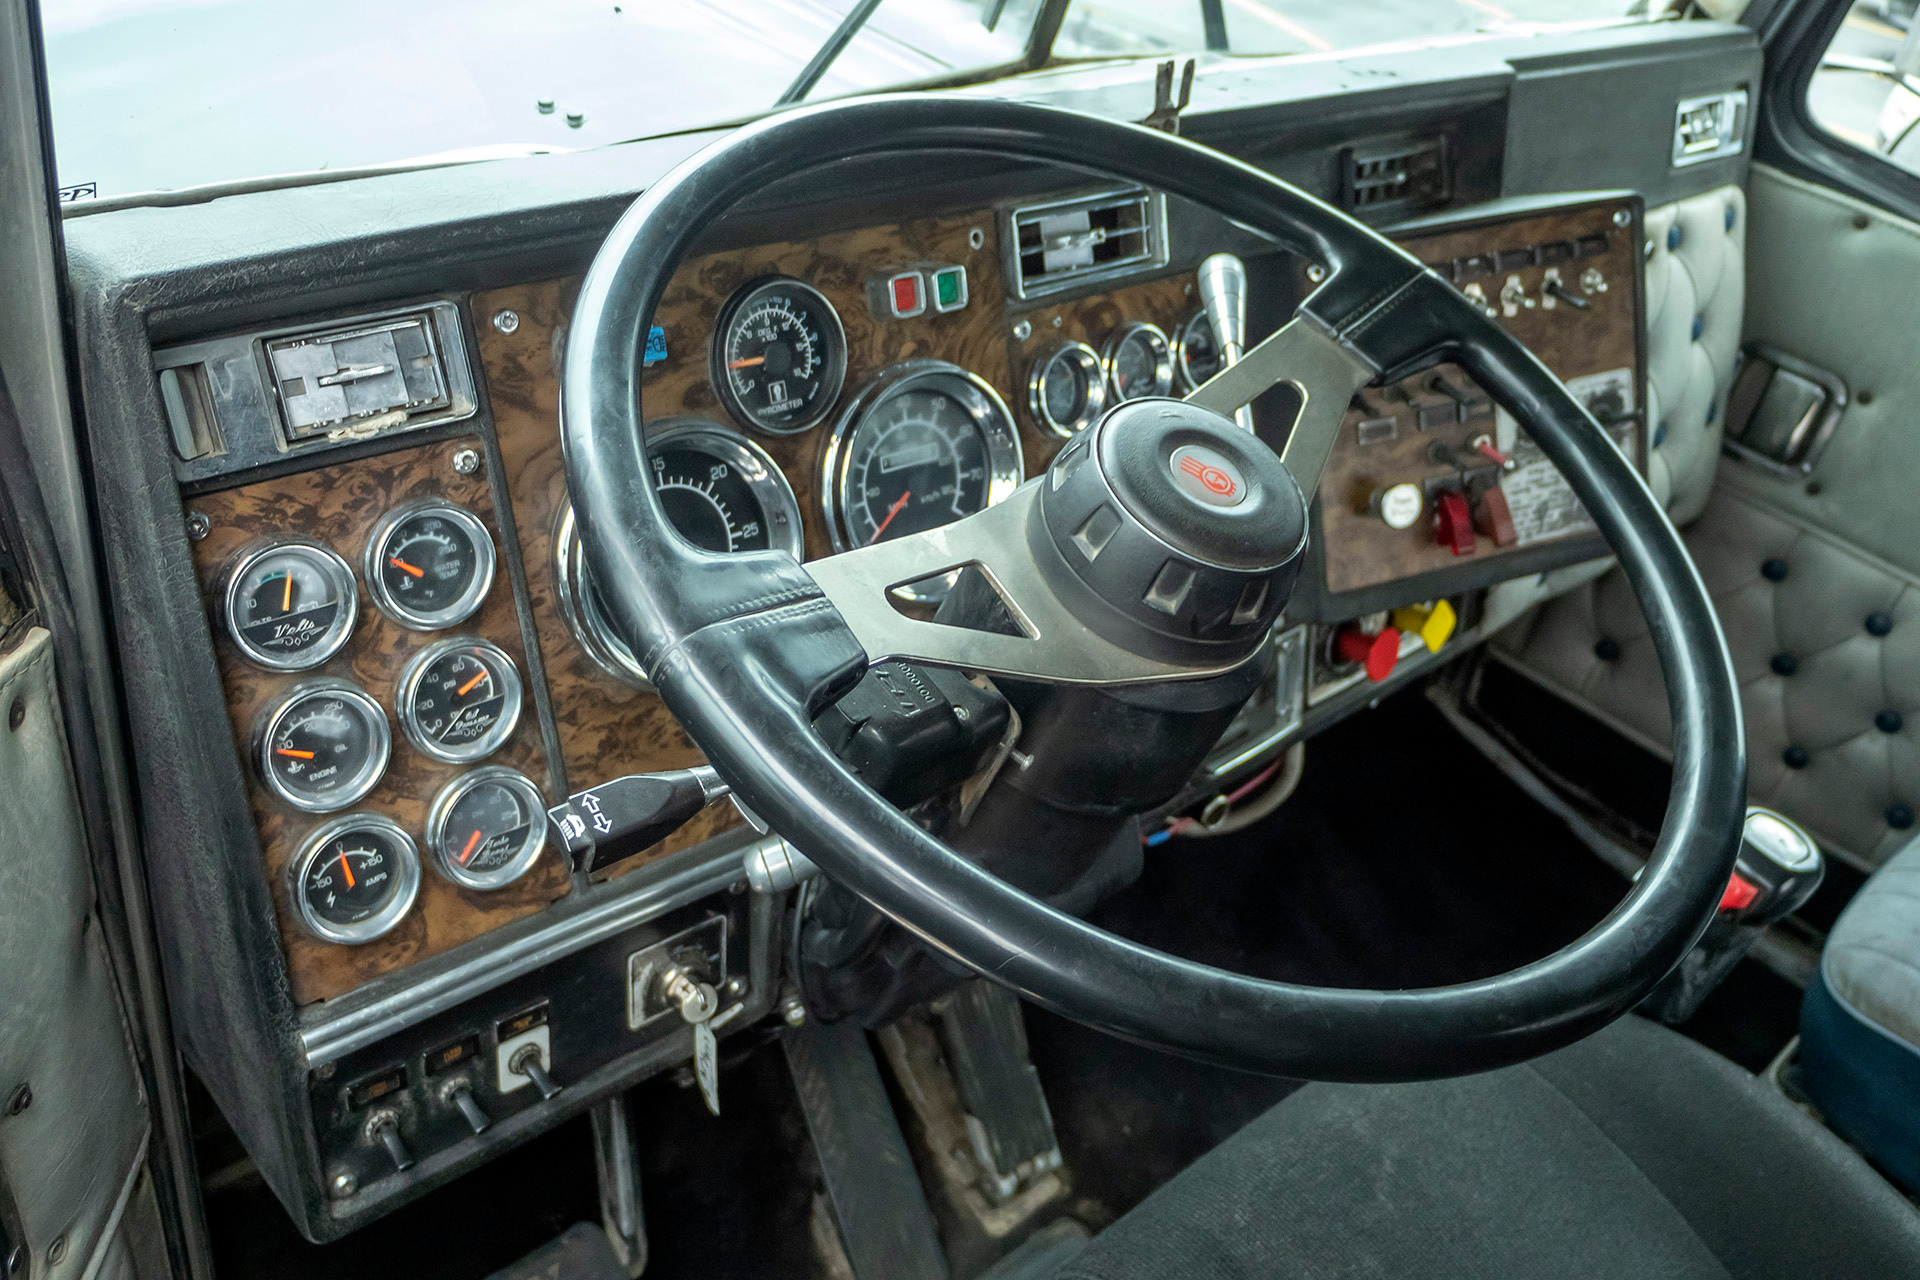 Used-1994-Kenworth-W900-DAY-CAB-CAT-3406